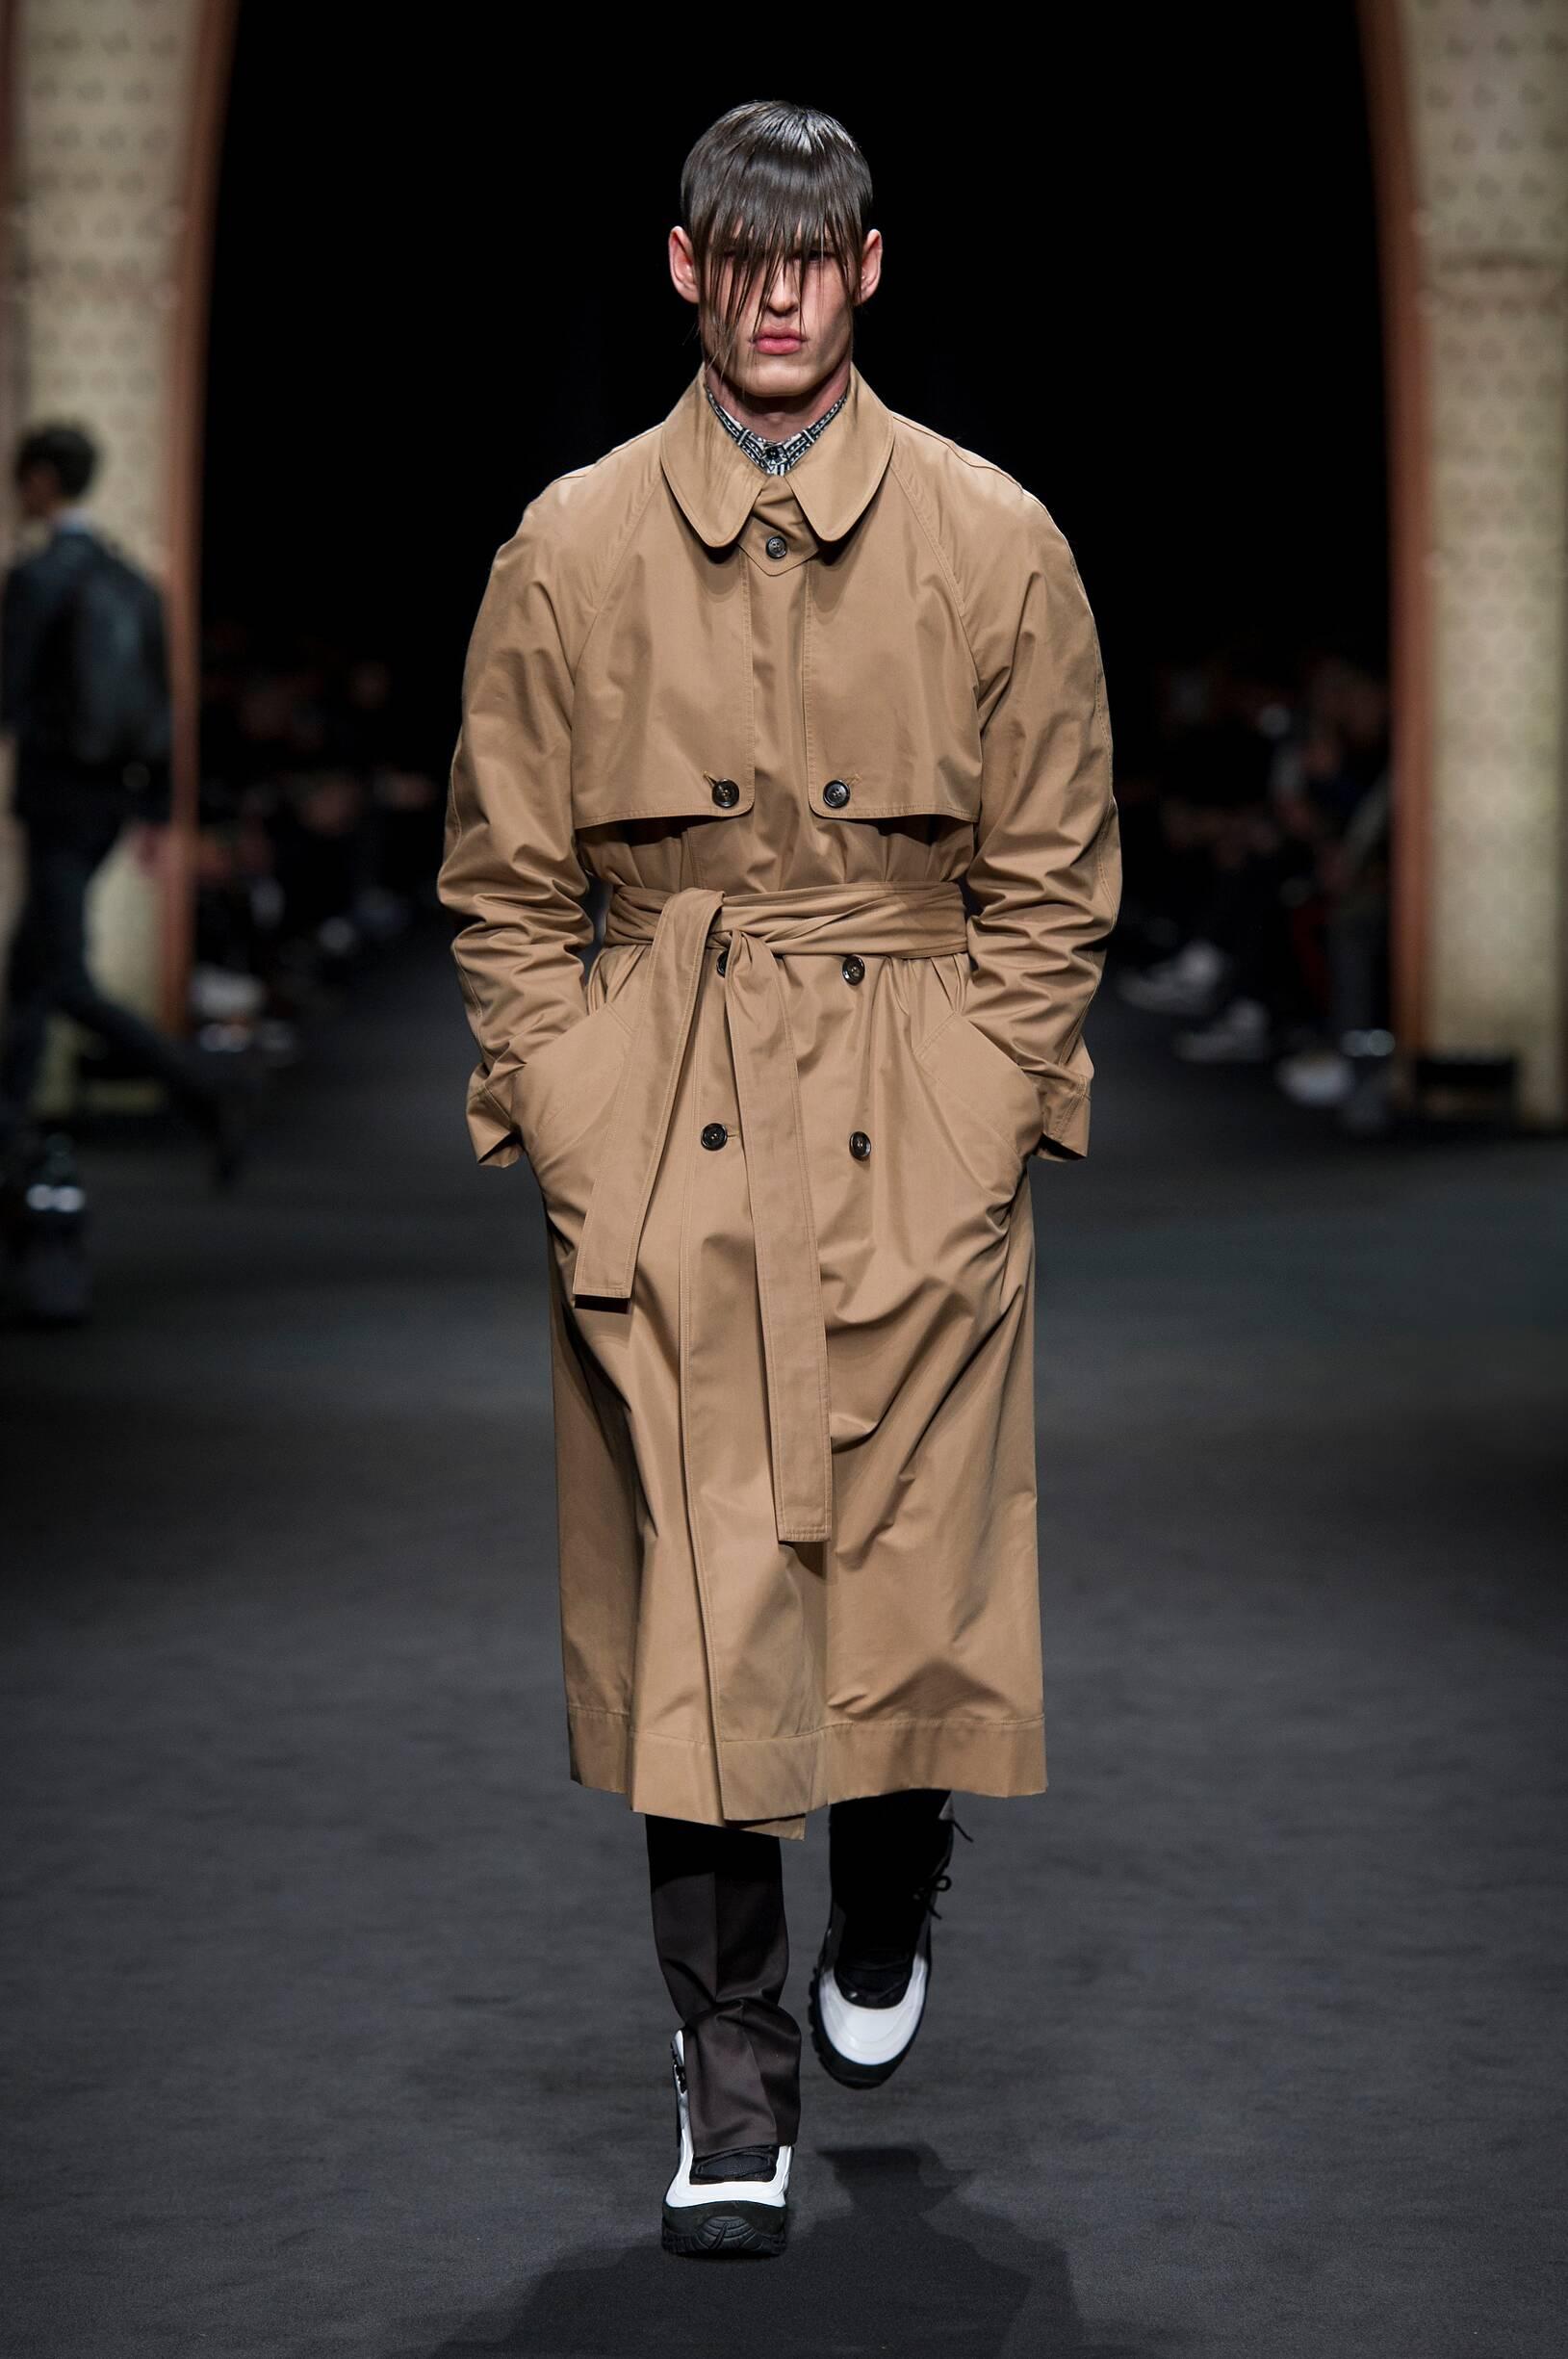 Runway Versace Fall Winter 2017 Men's Collection Milan Fashion Week